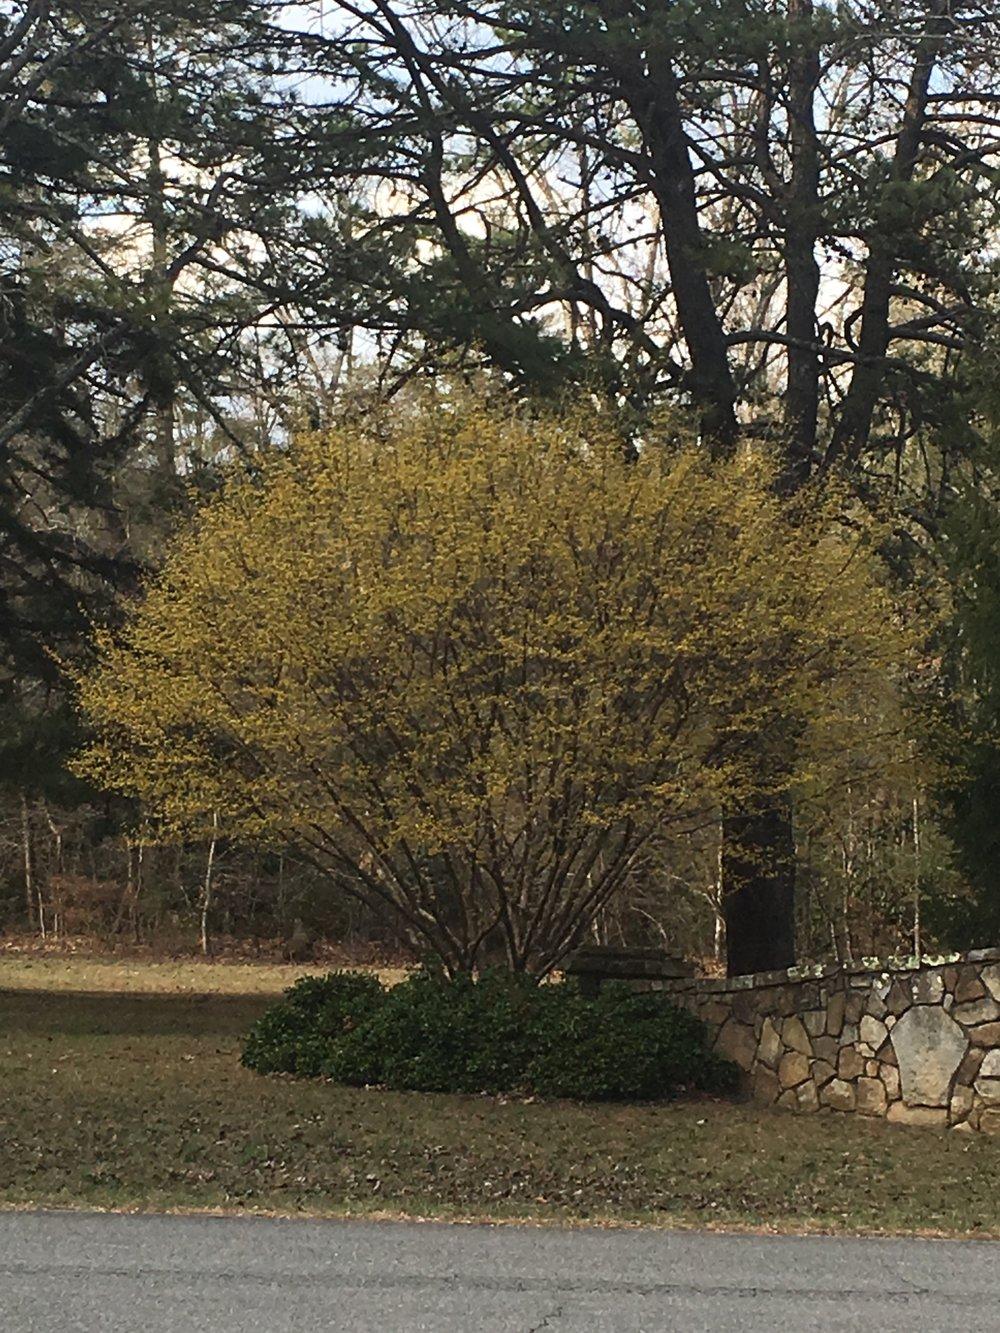 Cornus mas; Cornelian cherry dogwood